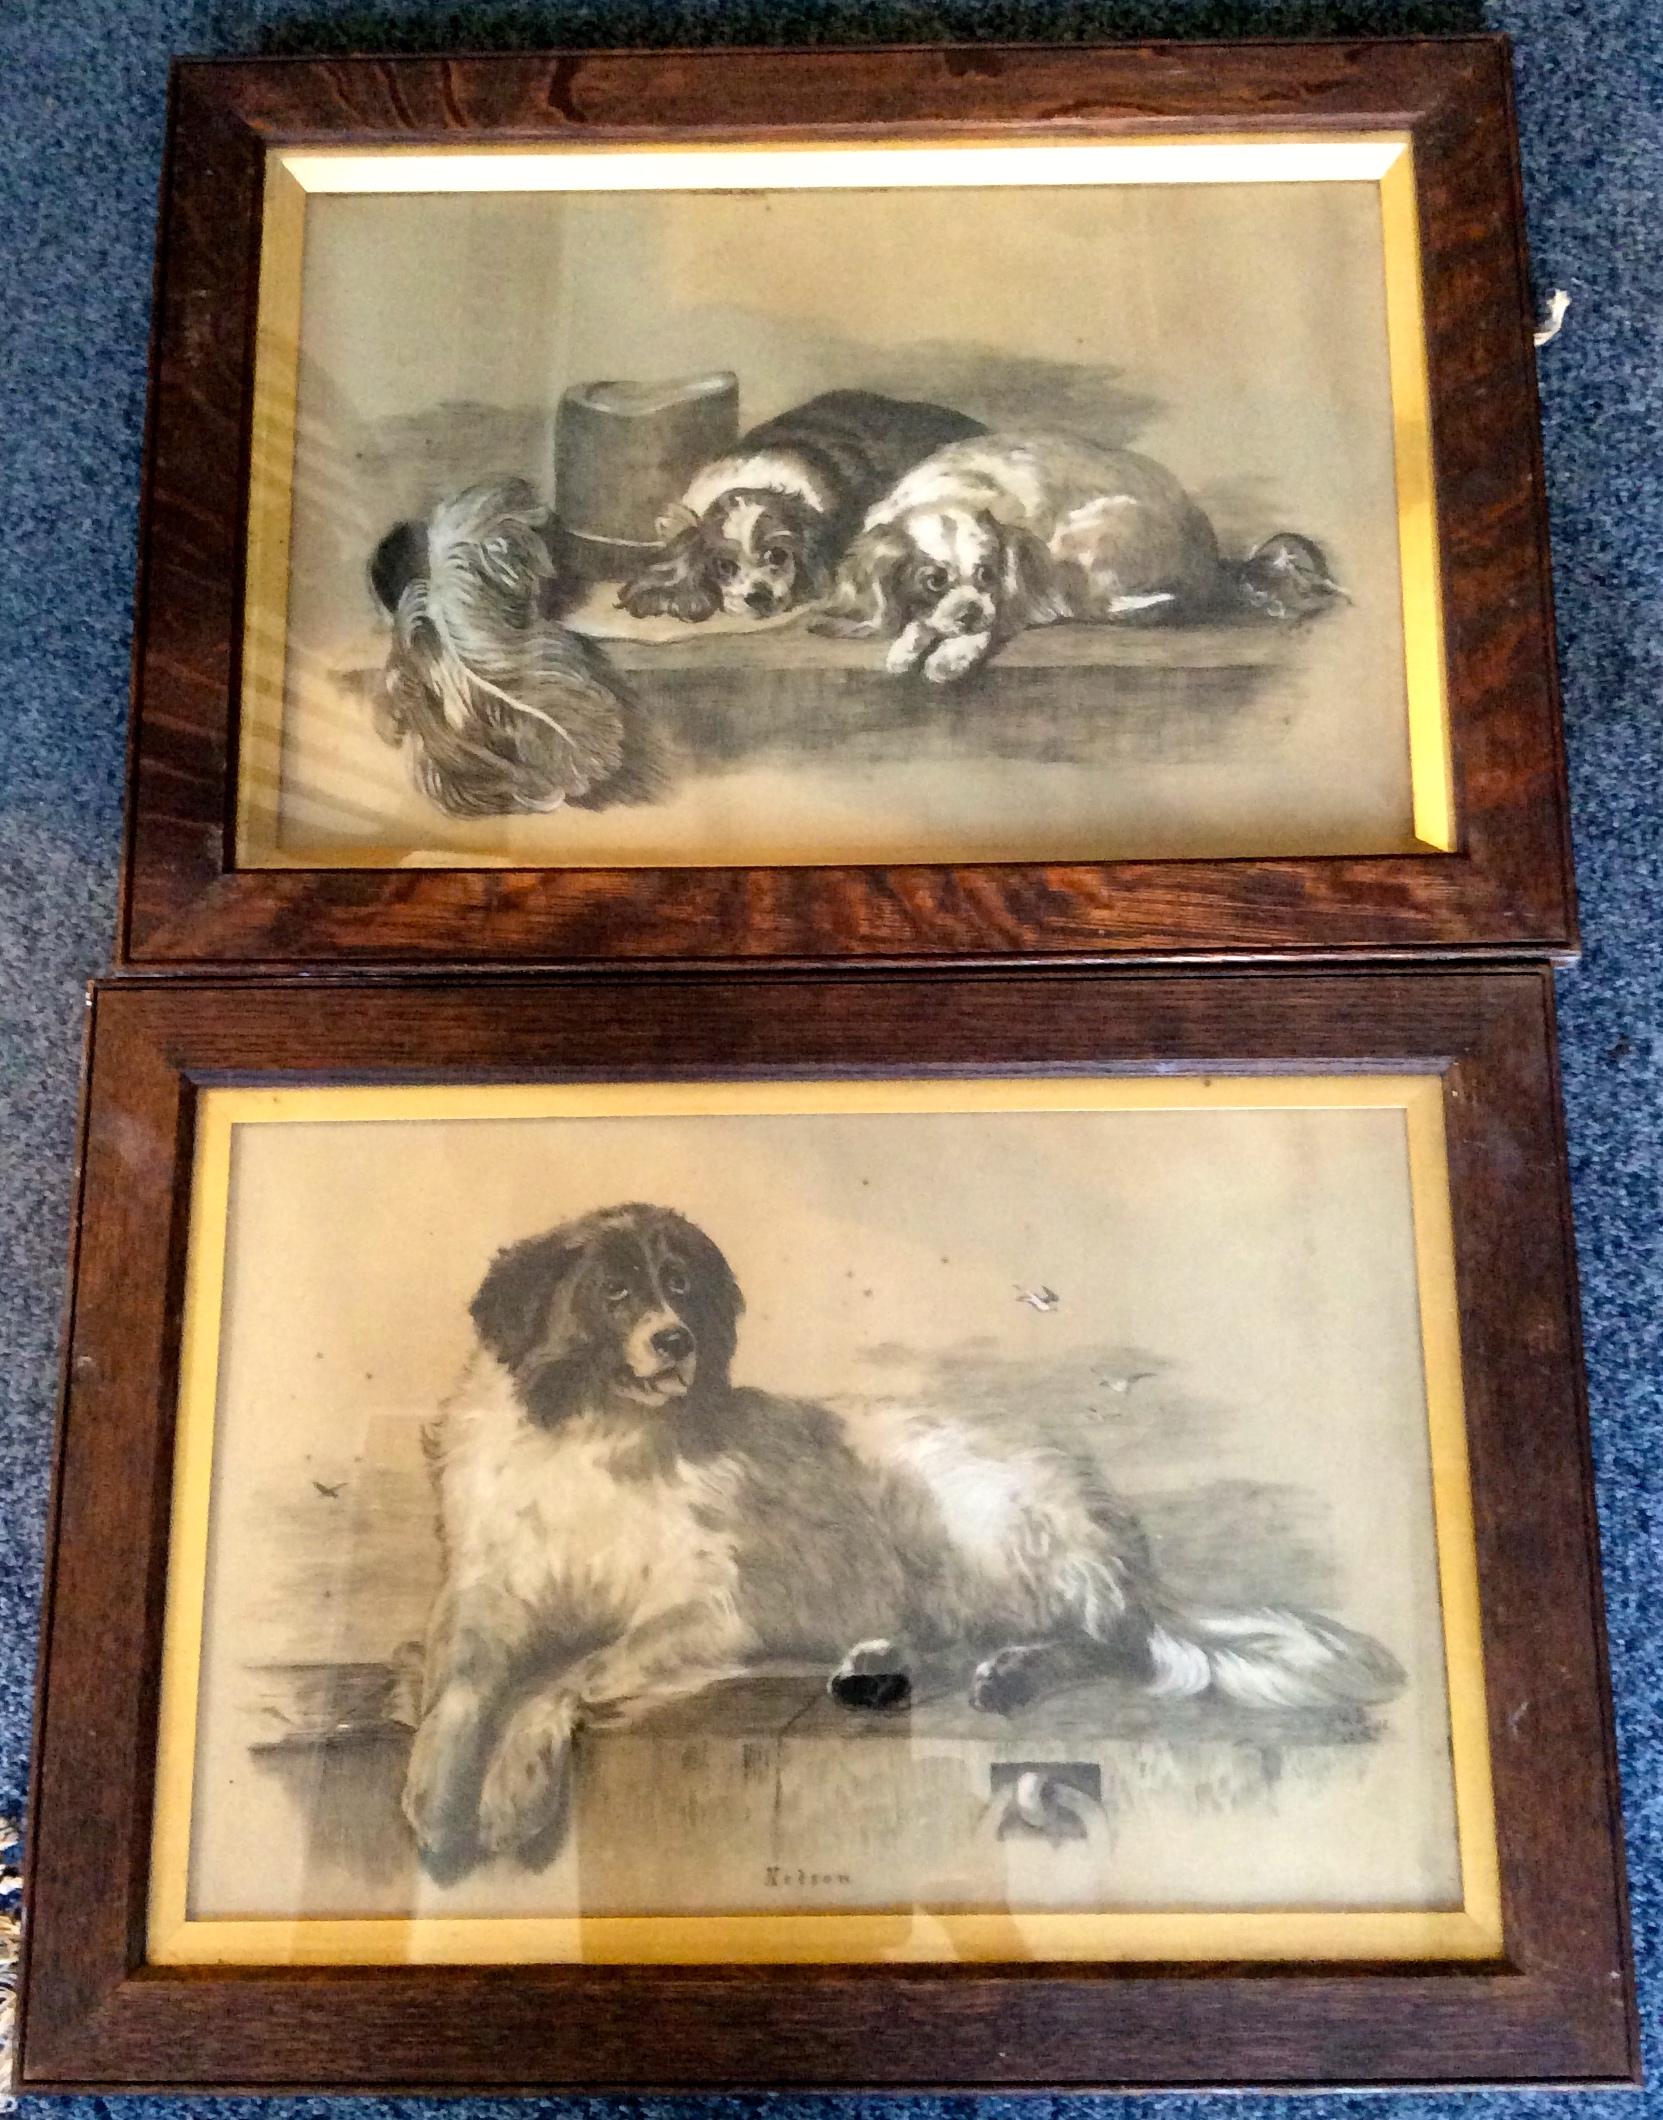 Lot 467 - Two good quality pencil sketch dog portraits monogrammed E W B '81